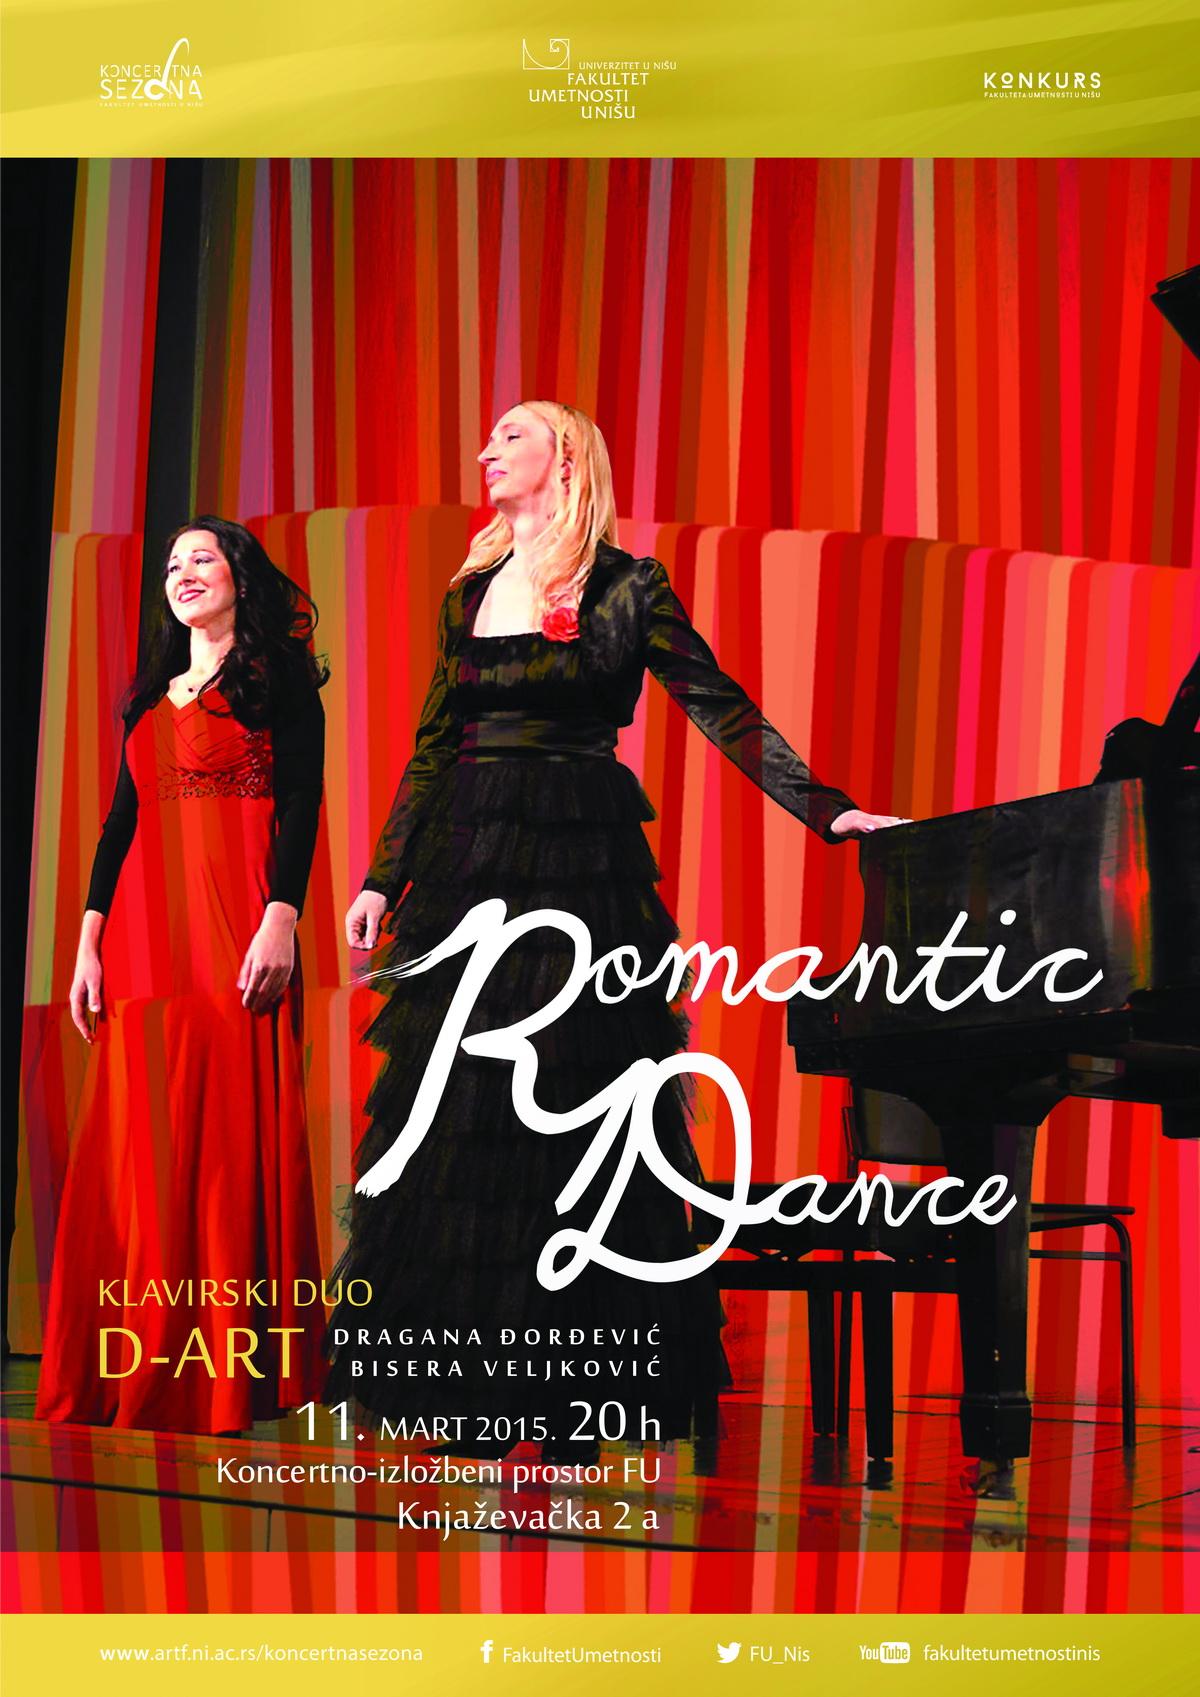 PLAKAT 01 Romantic Duo da